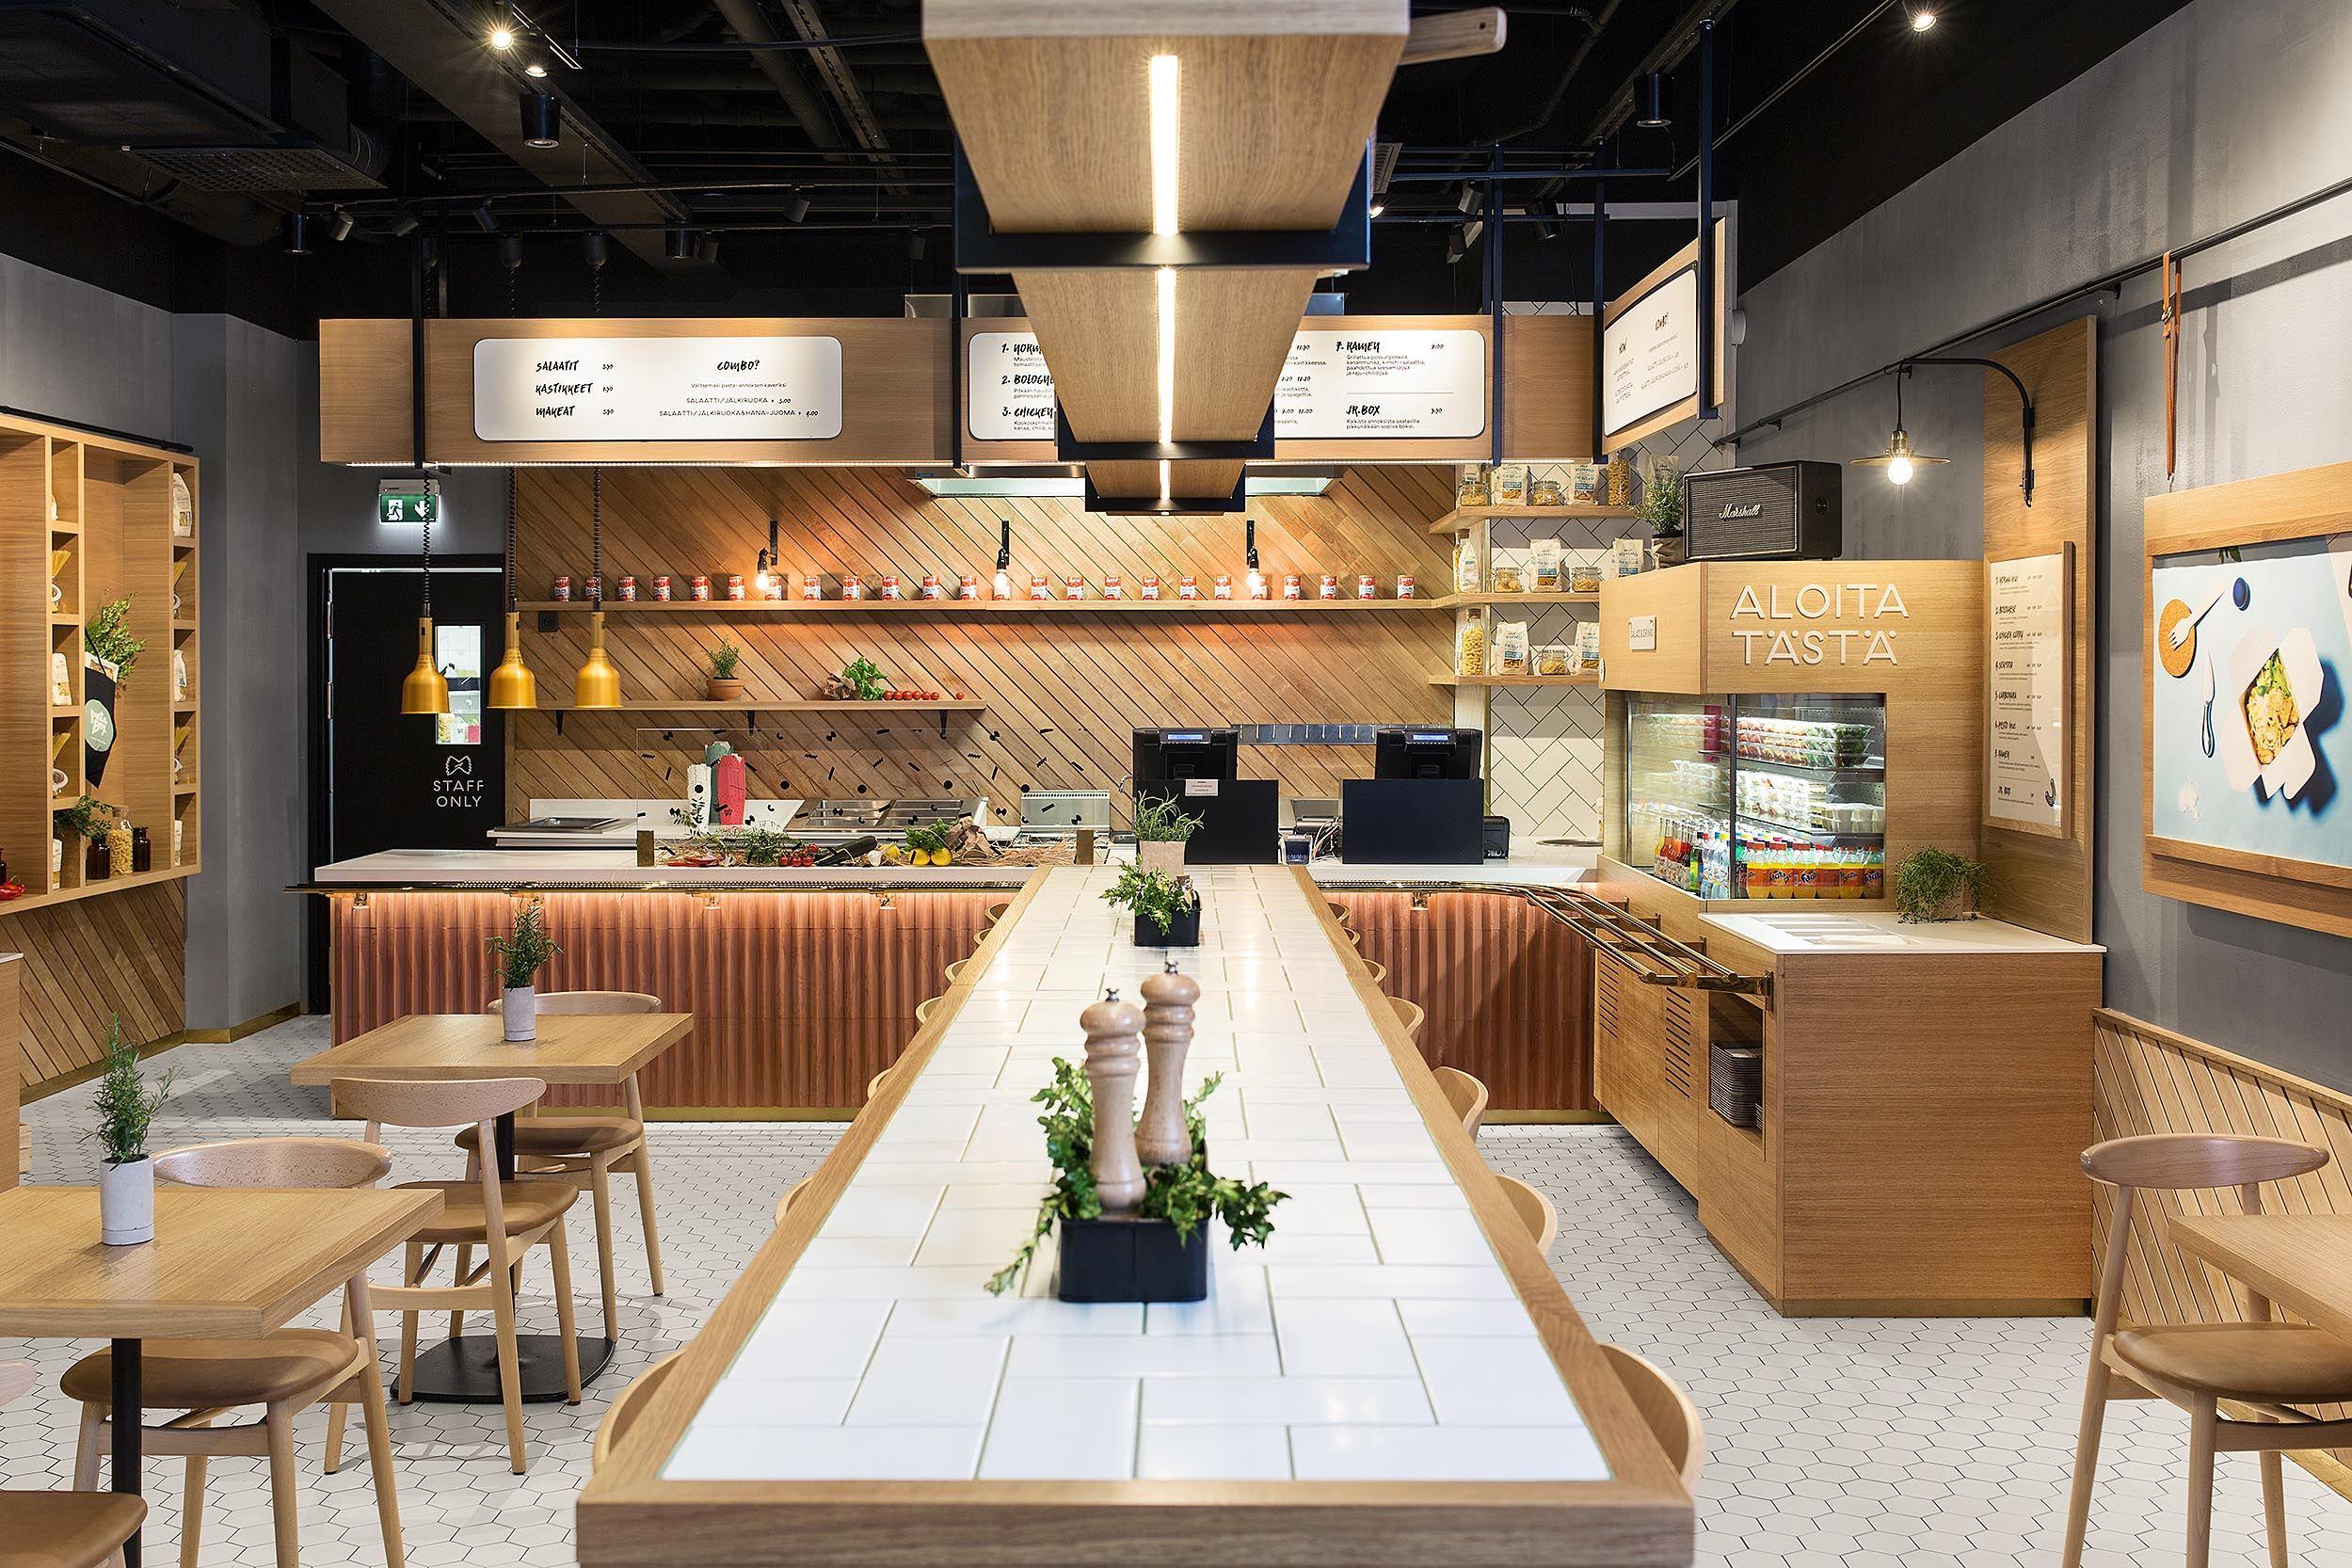 pasta box design kuudes oy interior design identity fast food rh pinterest com interior design small fast food interior design fast food restaurants